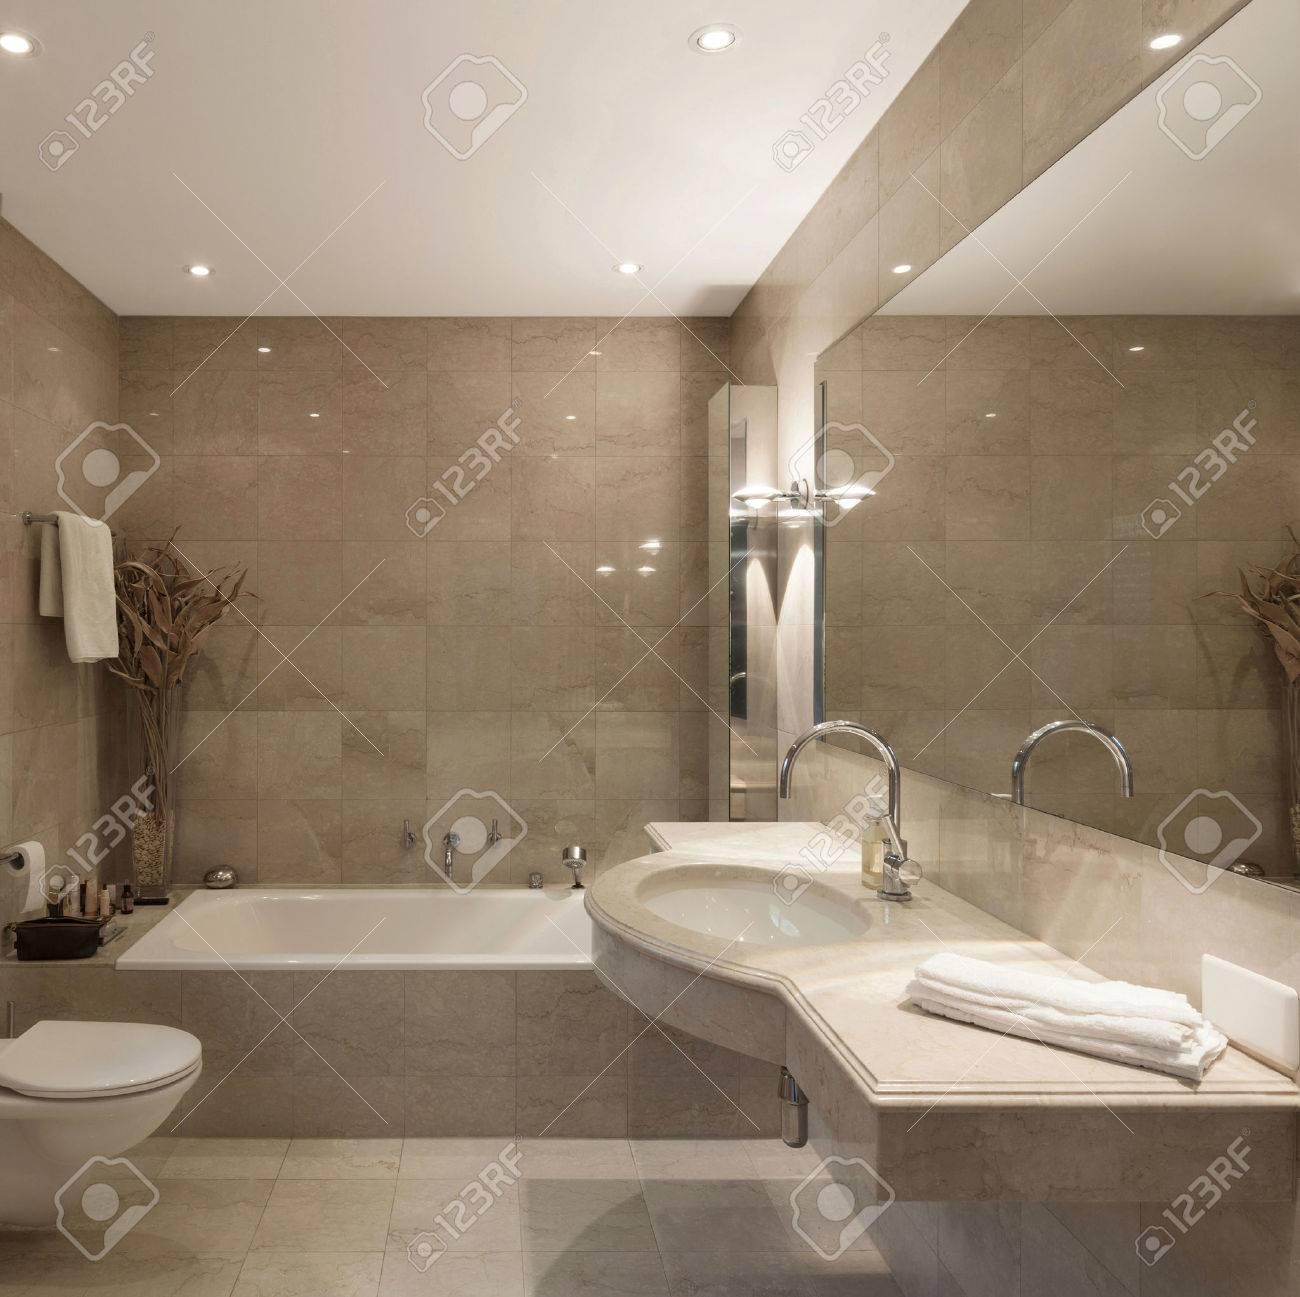 Interior Of A Modern House, Bathroom, Classic Design Stock Photo   52266921